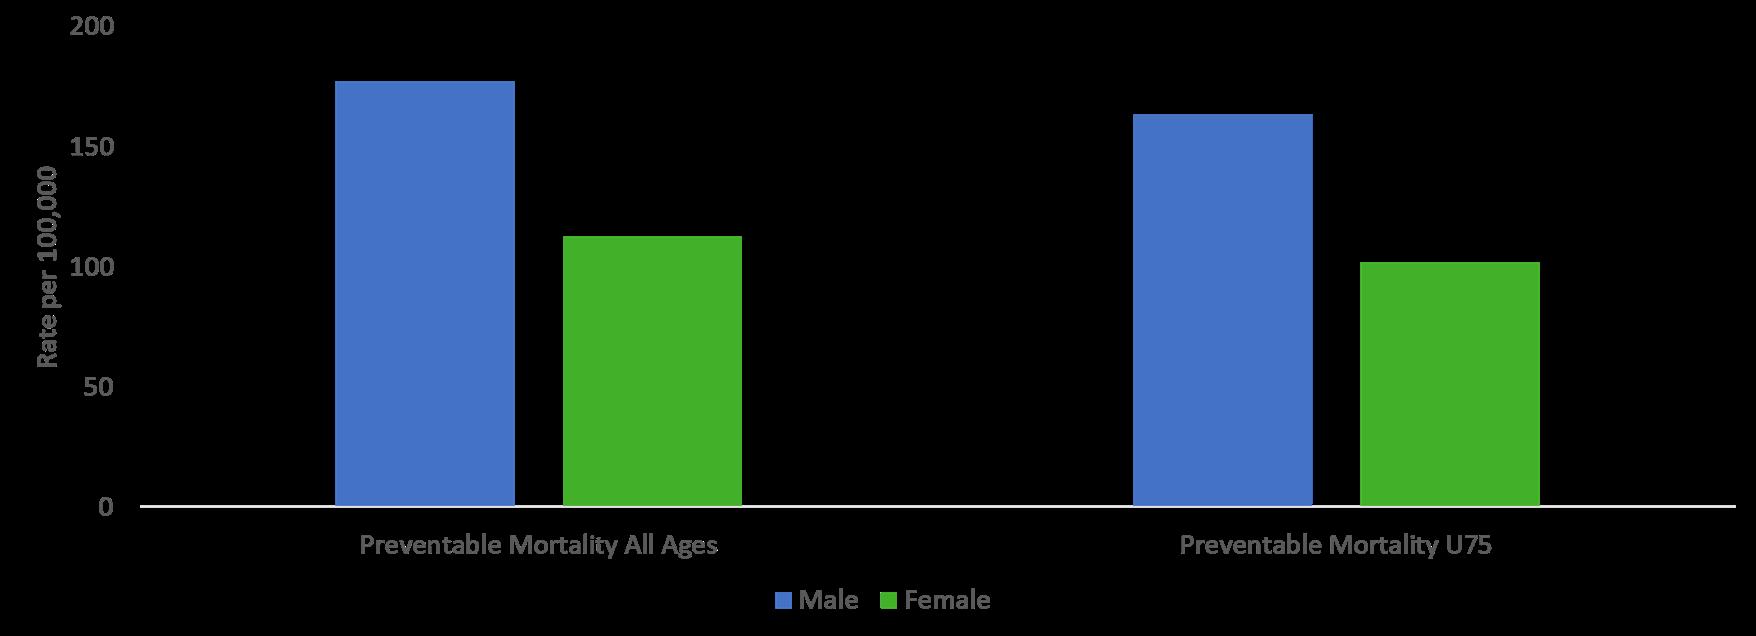 preventable mortality gender